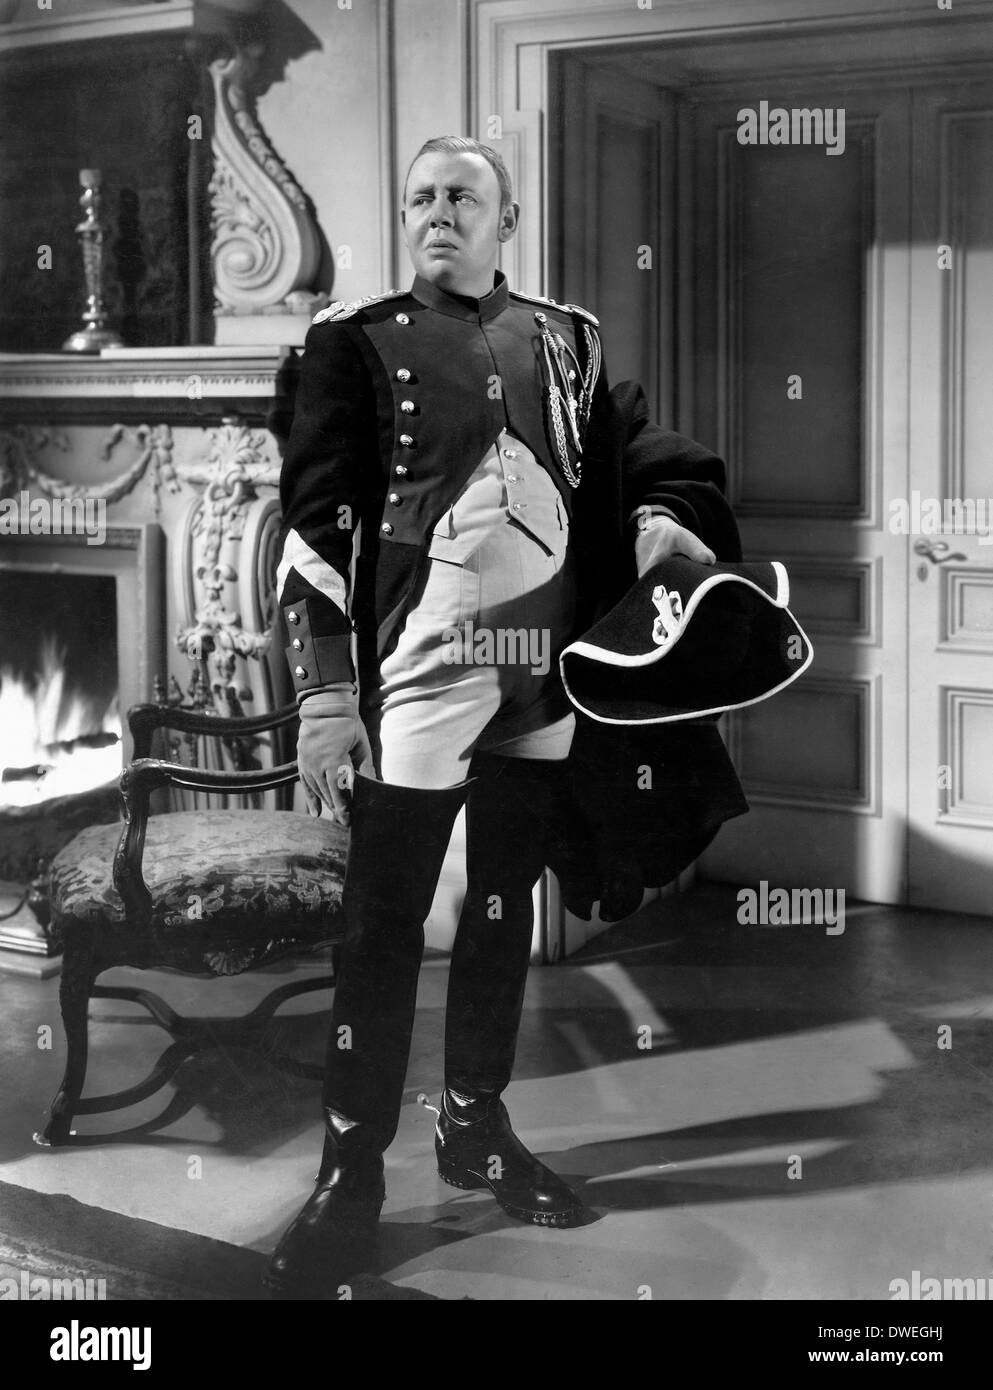 "Charles Laughton, on-set of the Film, ""Les Miserables"" directed by Richard  Boleslawski, 1935"